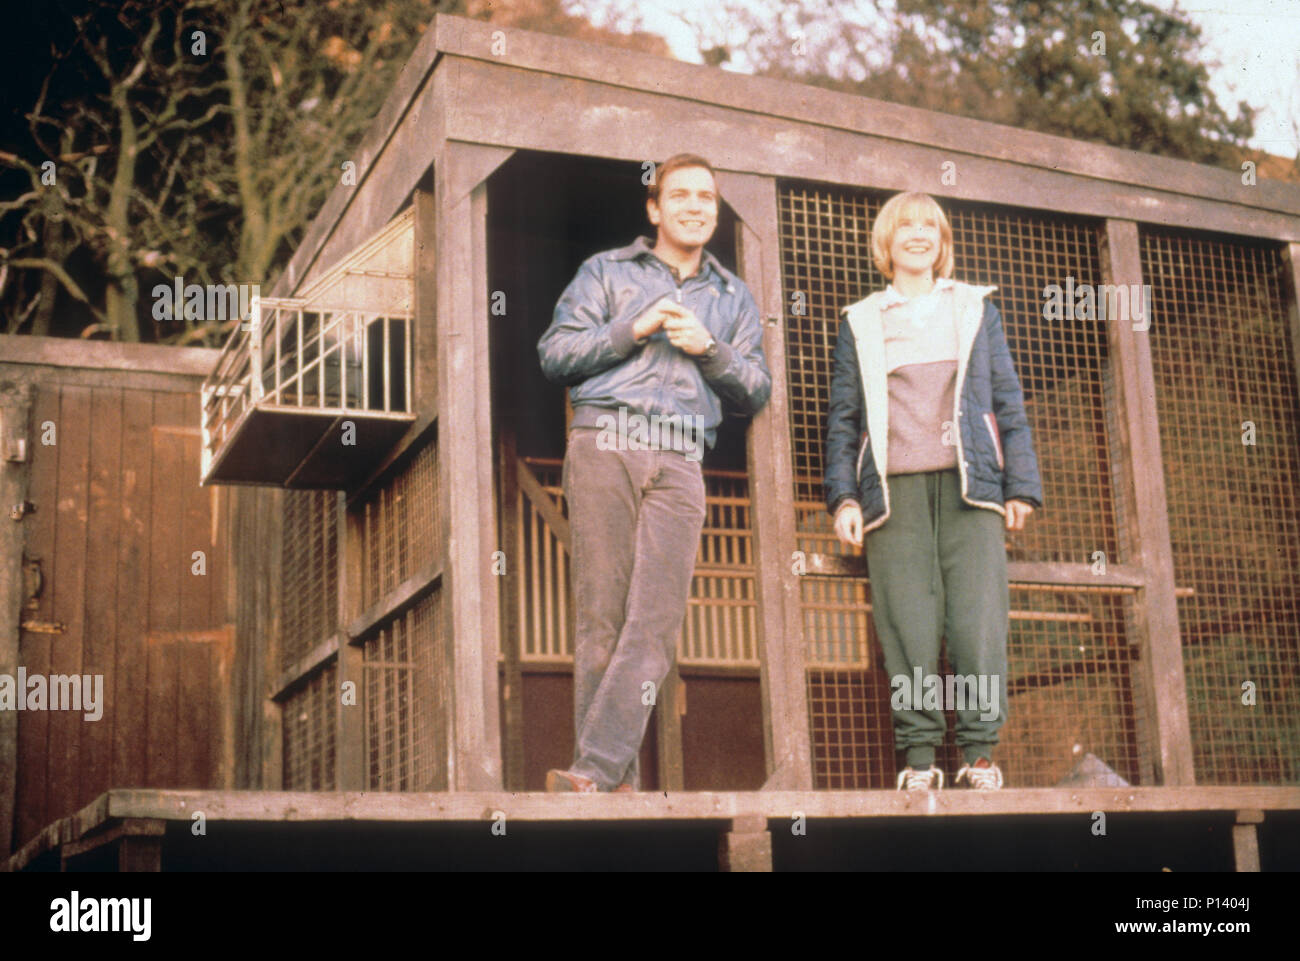 LITTLE VOICE 1998 Miramax film with Jane Horrocks and Ewan McGregor - Stock Image